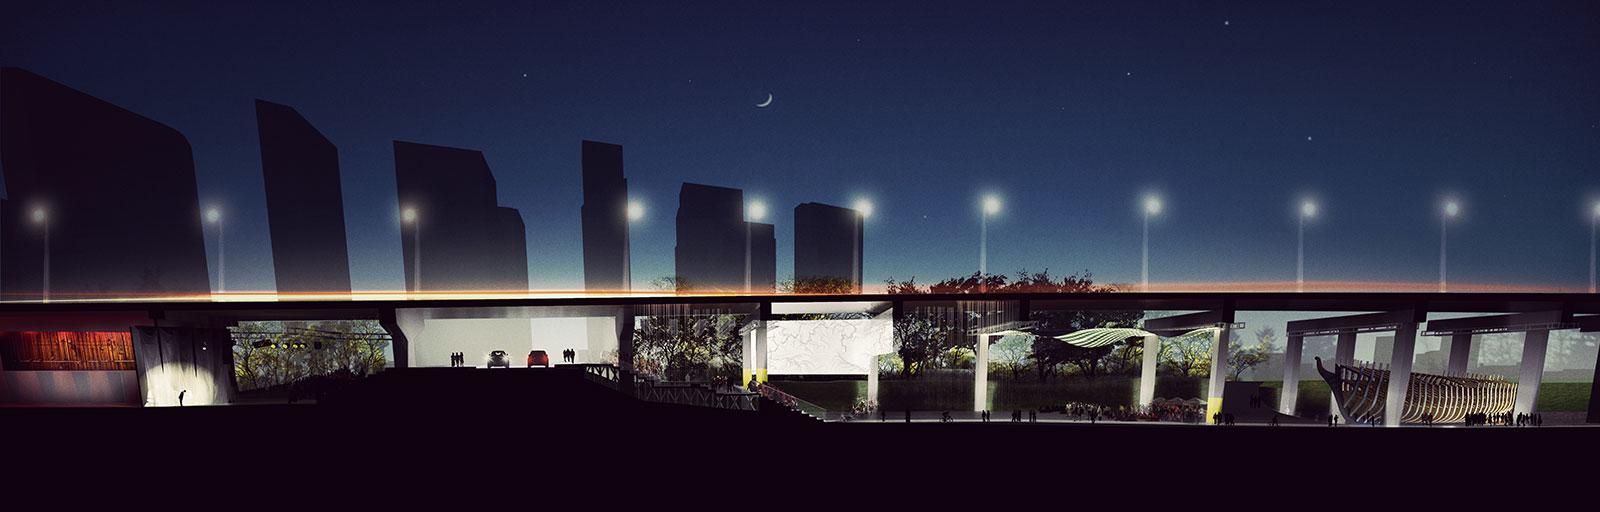 render-night.jpg